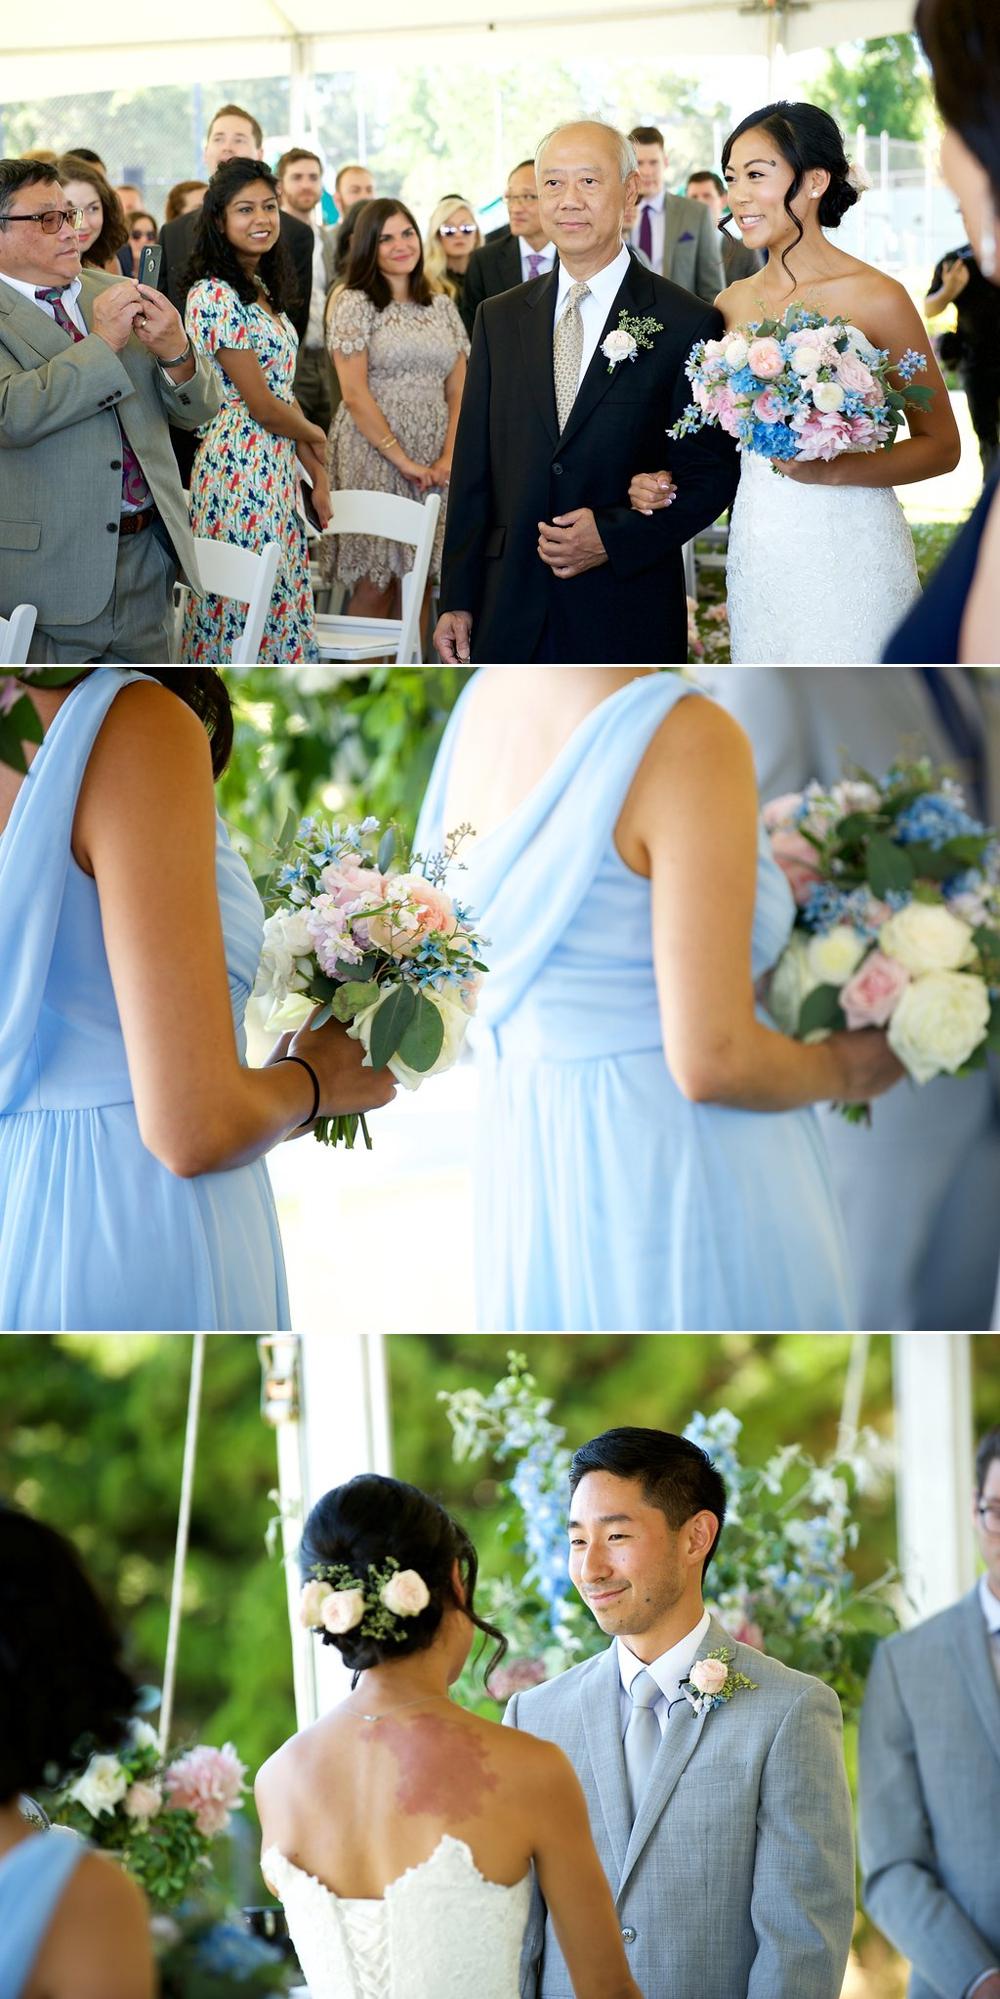 blue-and-blush-wedding-seattle-tennis-club 10.jpg